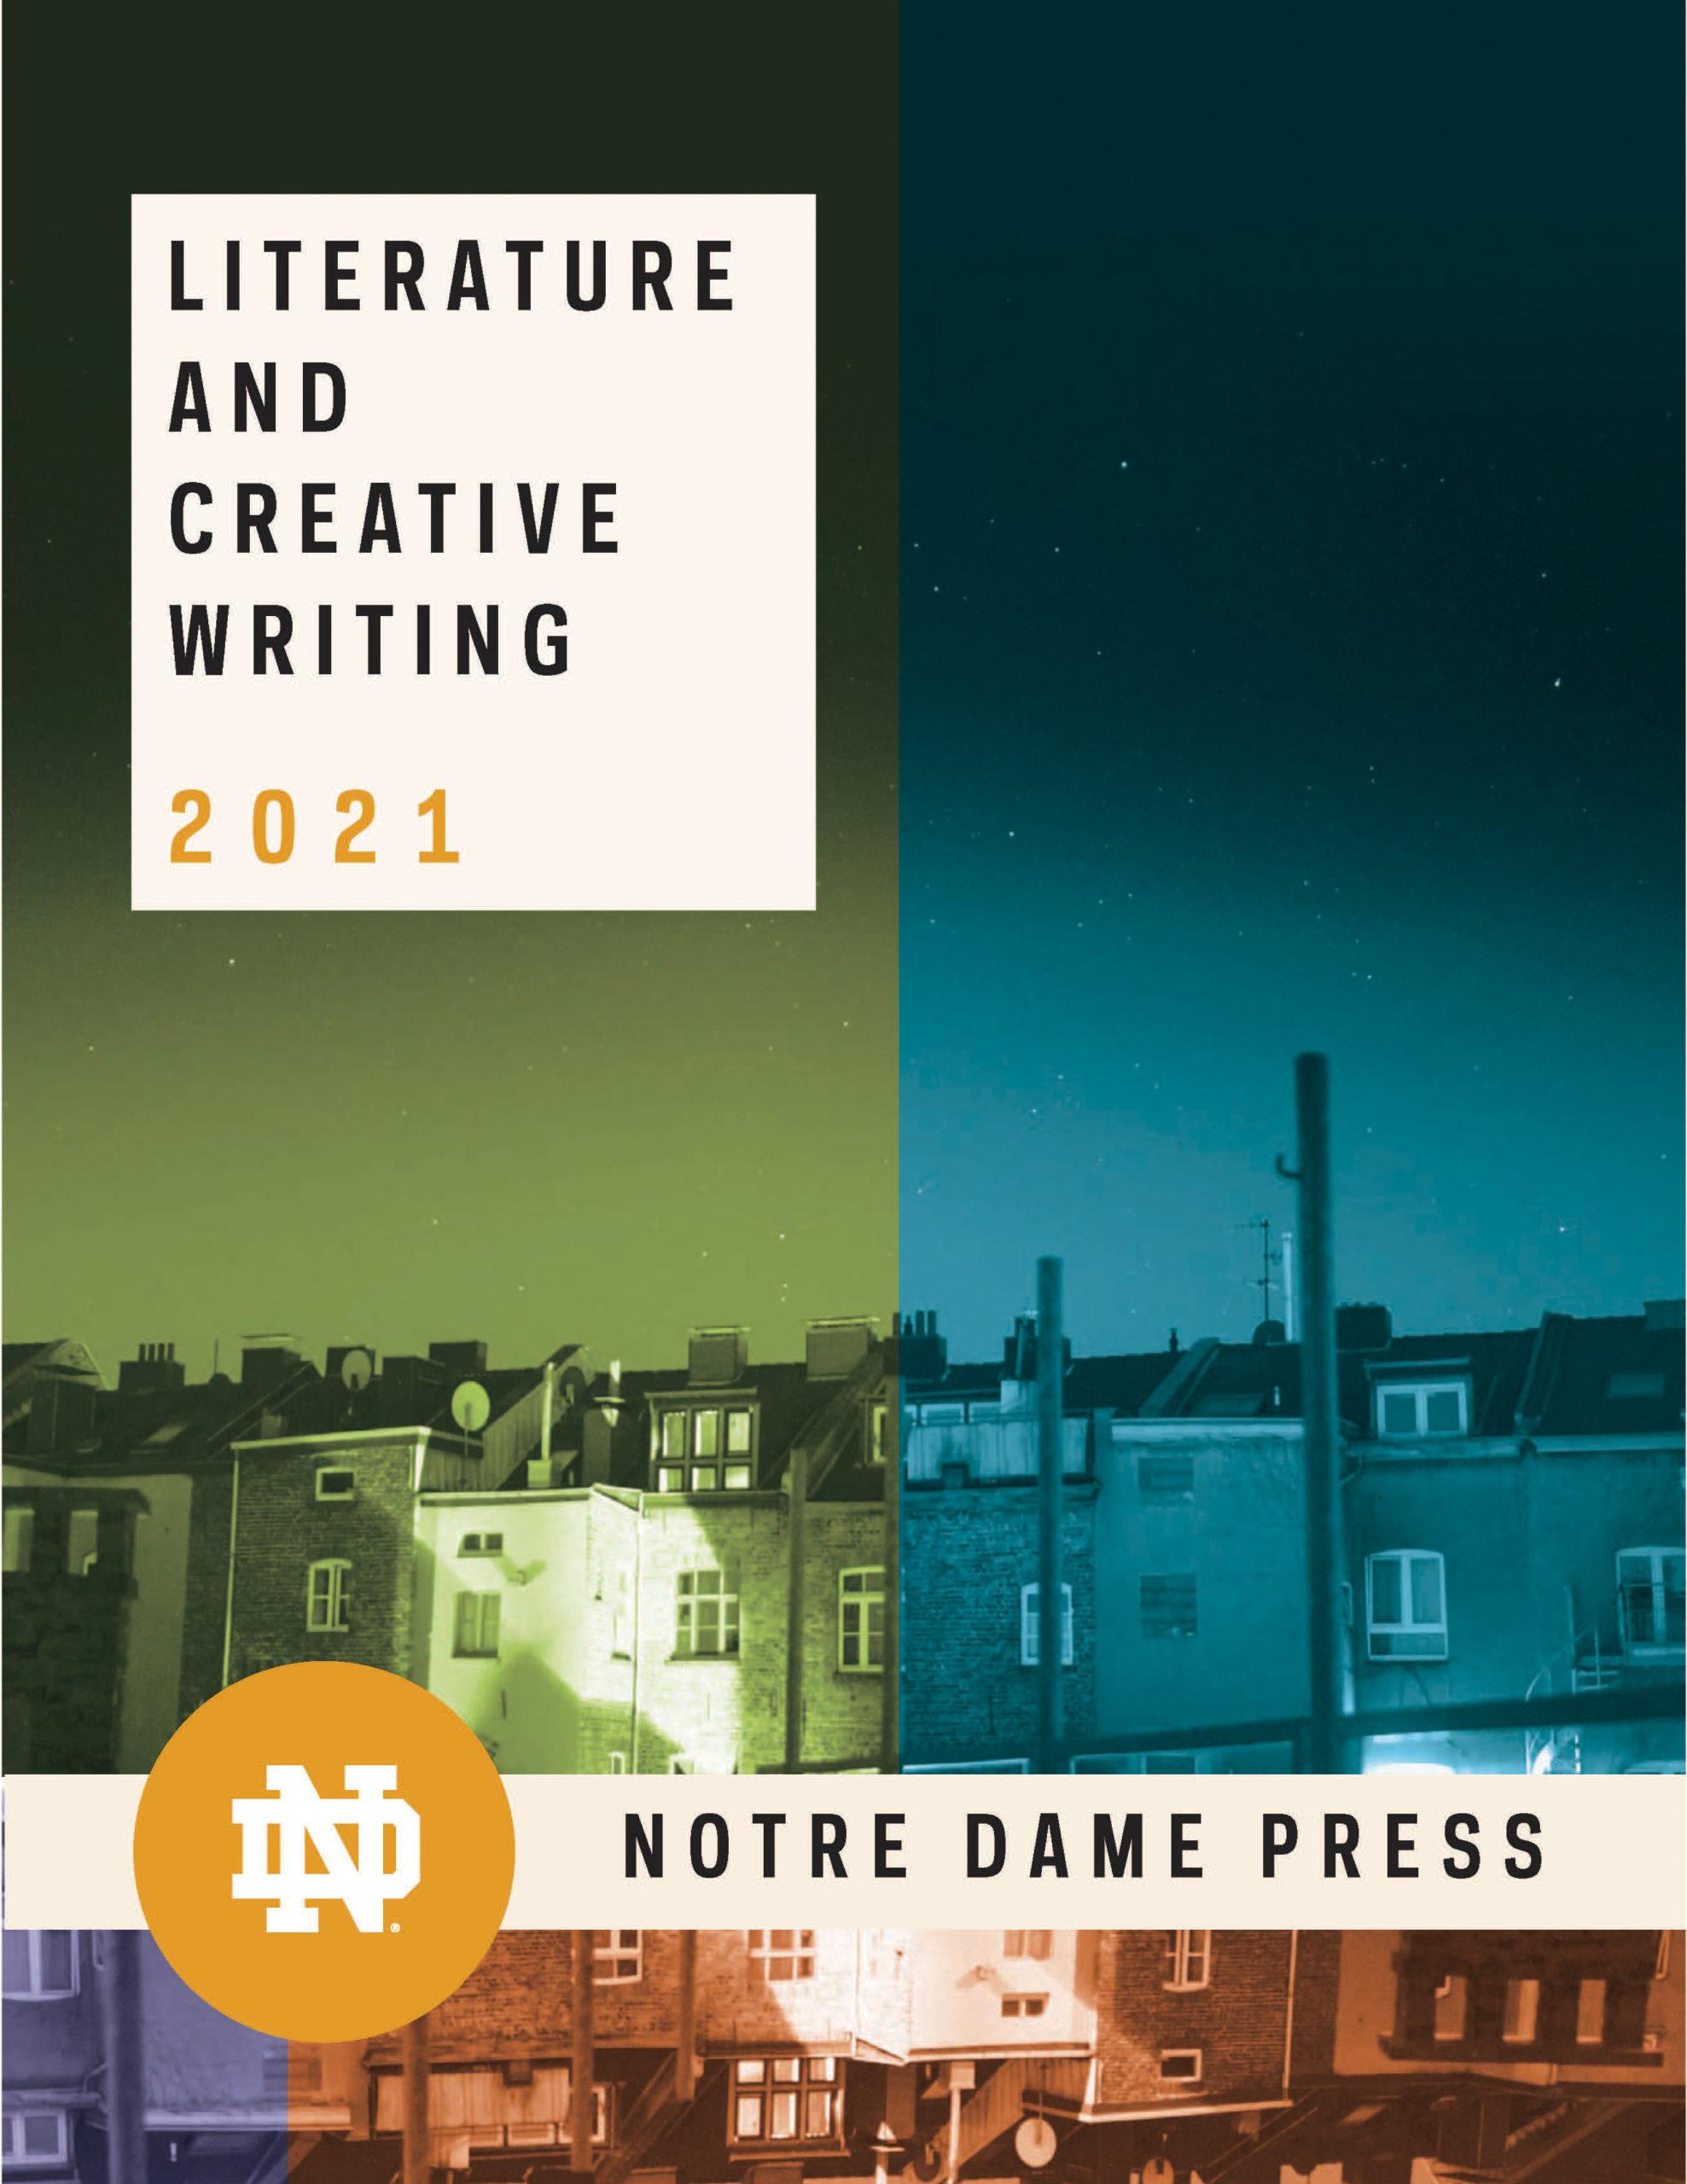 Literature and Creative Writing 2021